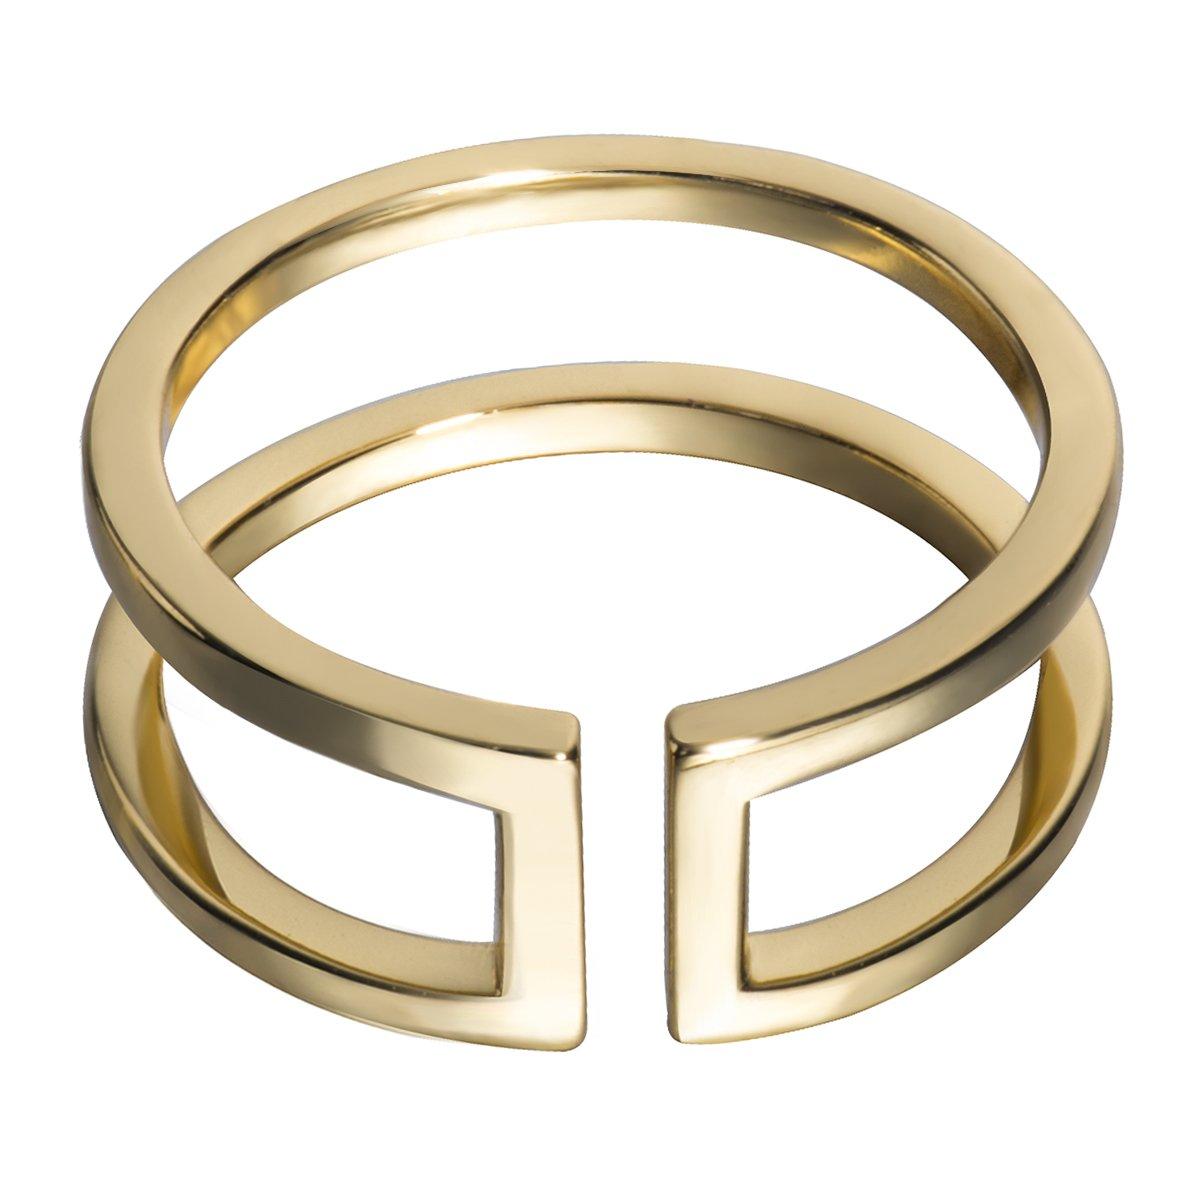 Fonsalette Open Bar Ring Sterling Silver Double Line Bar Ring Parallel Bar Ring F31003-G-8